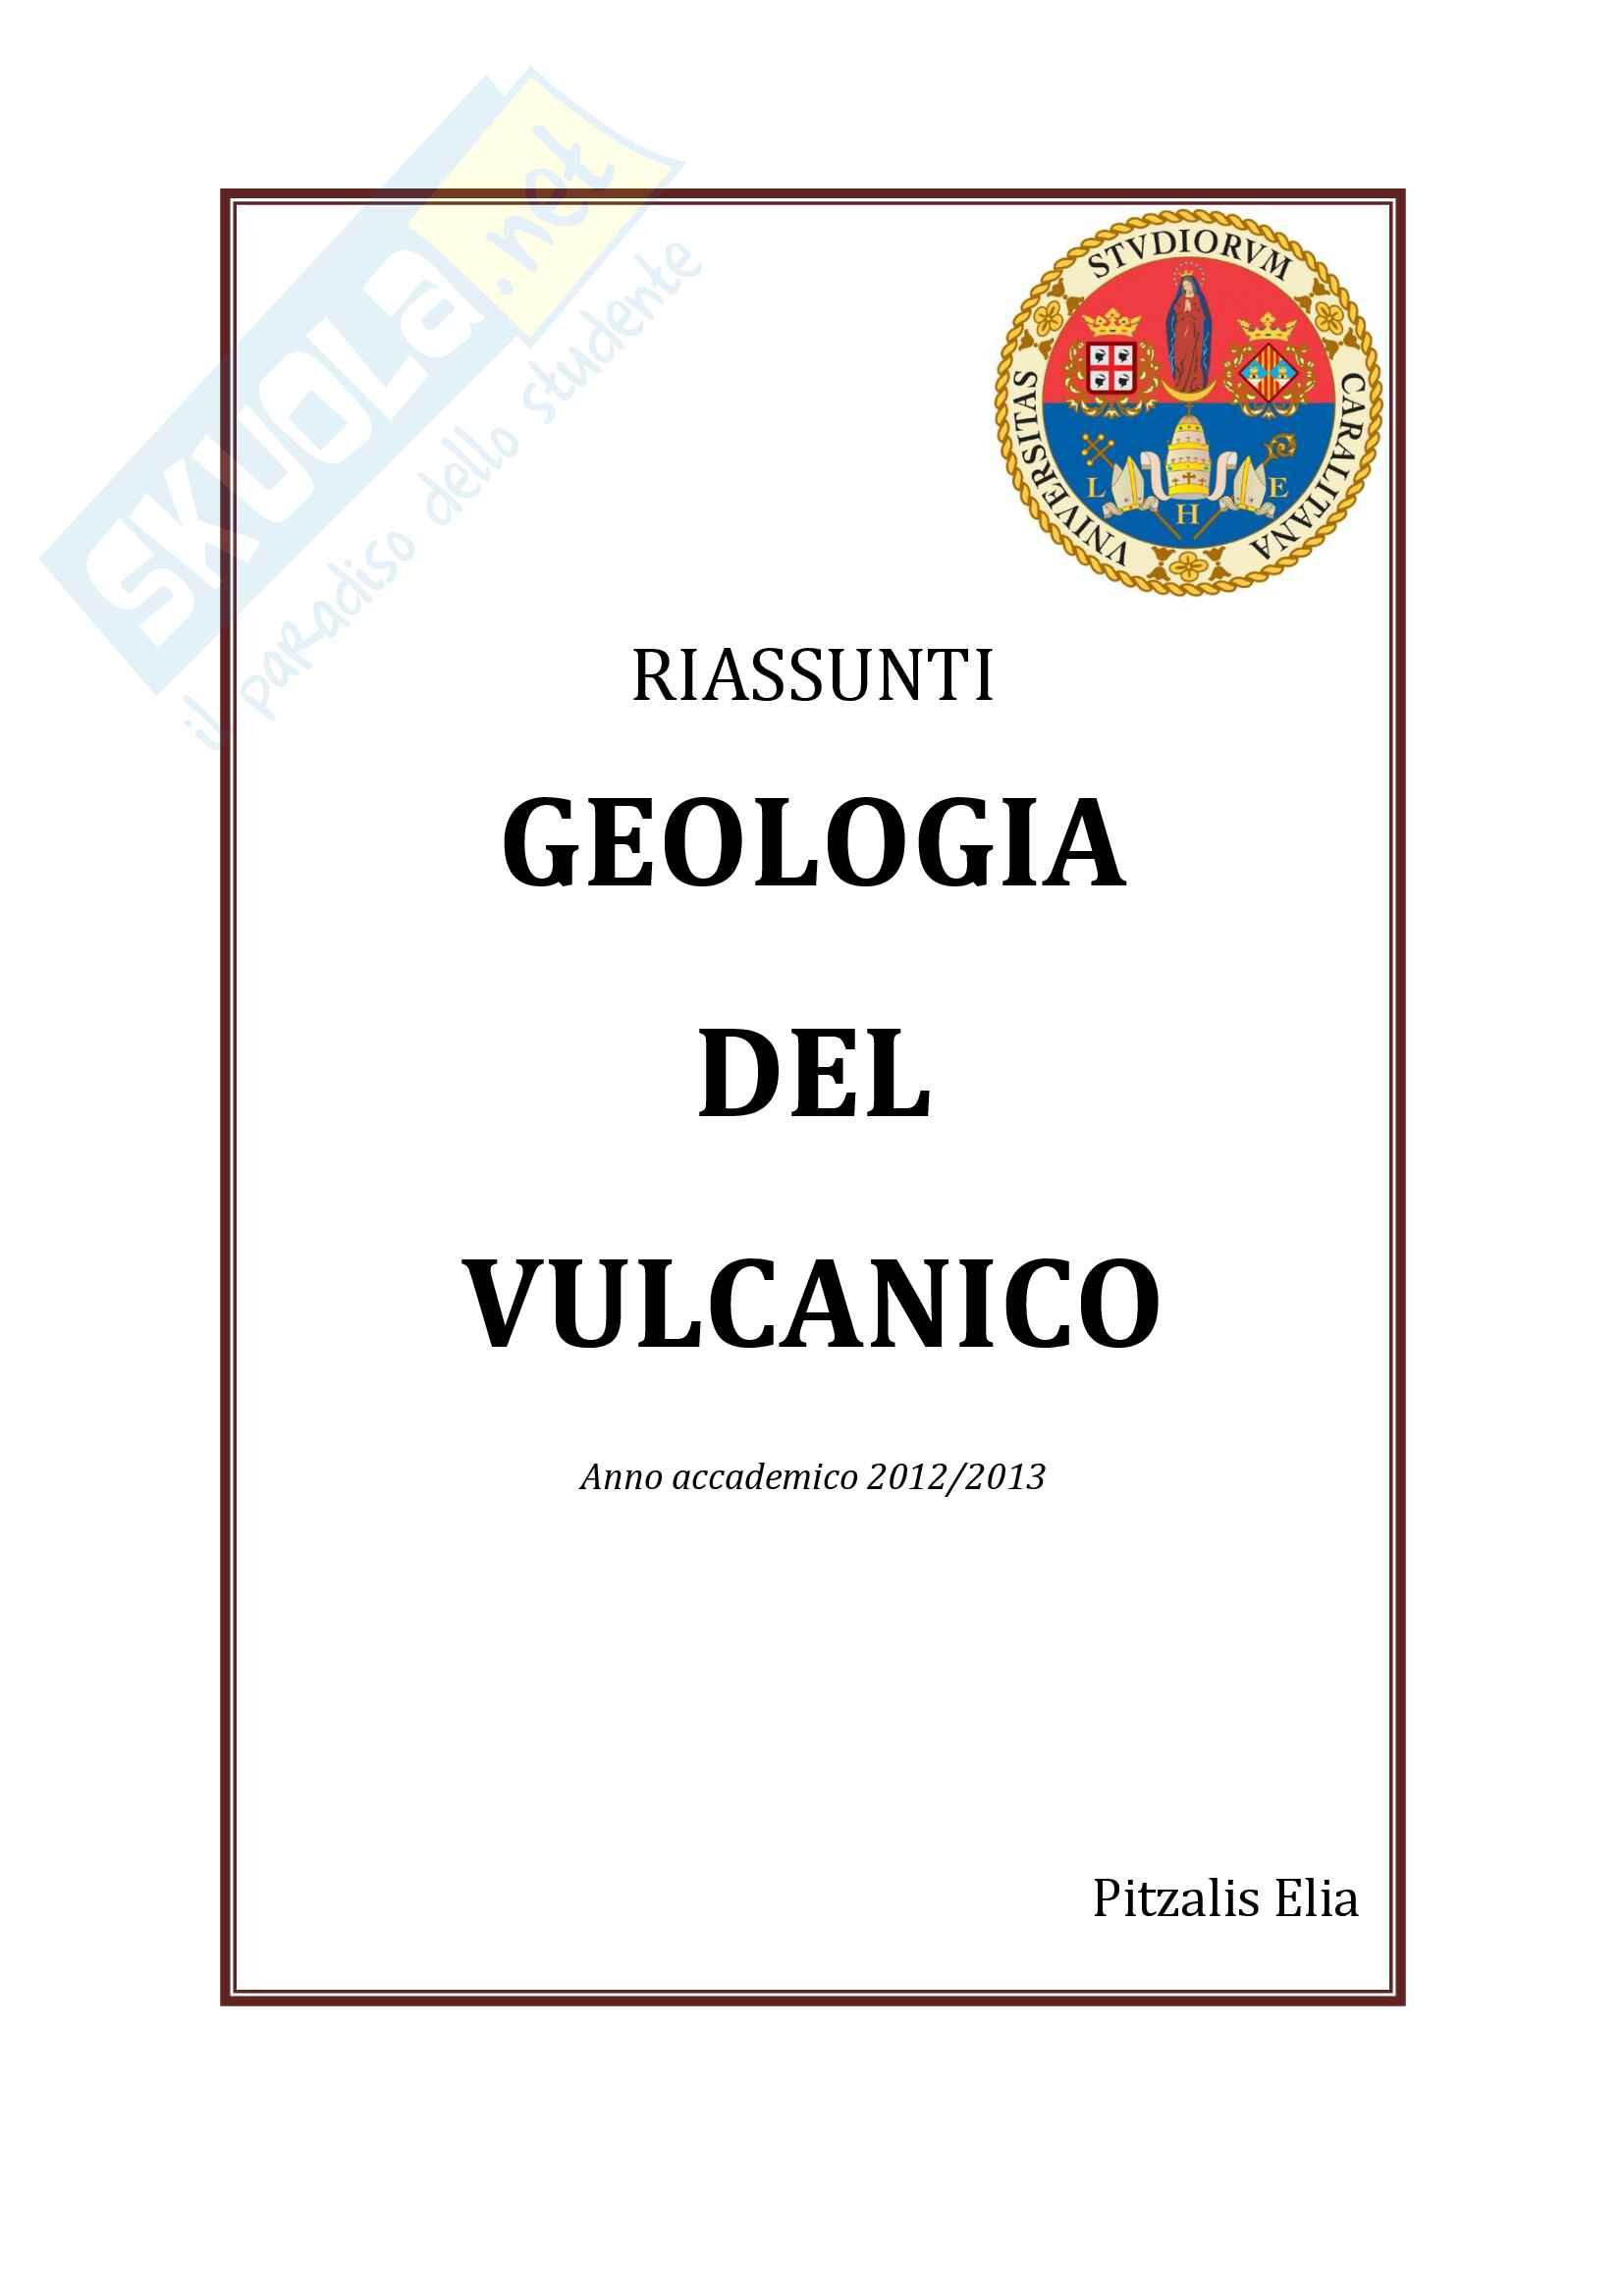 Geologia del Vulcanico